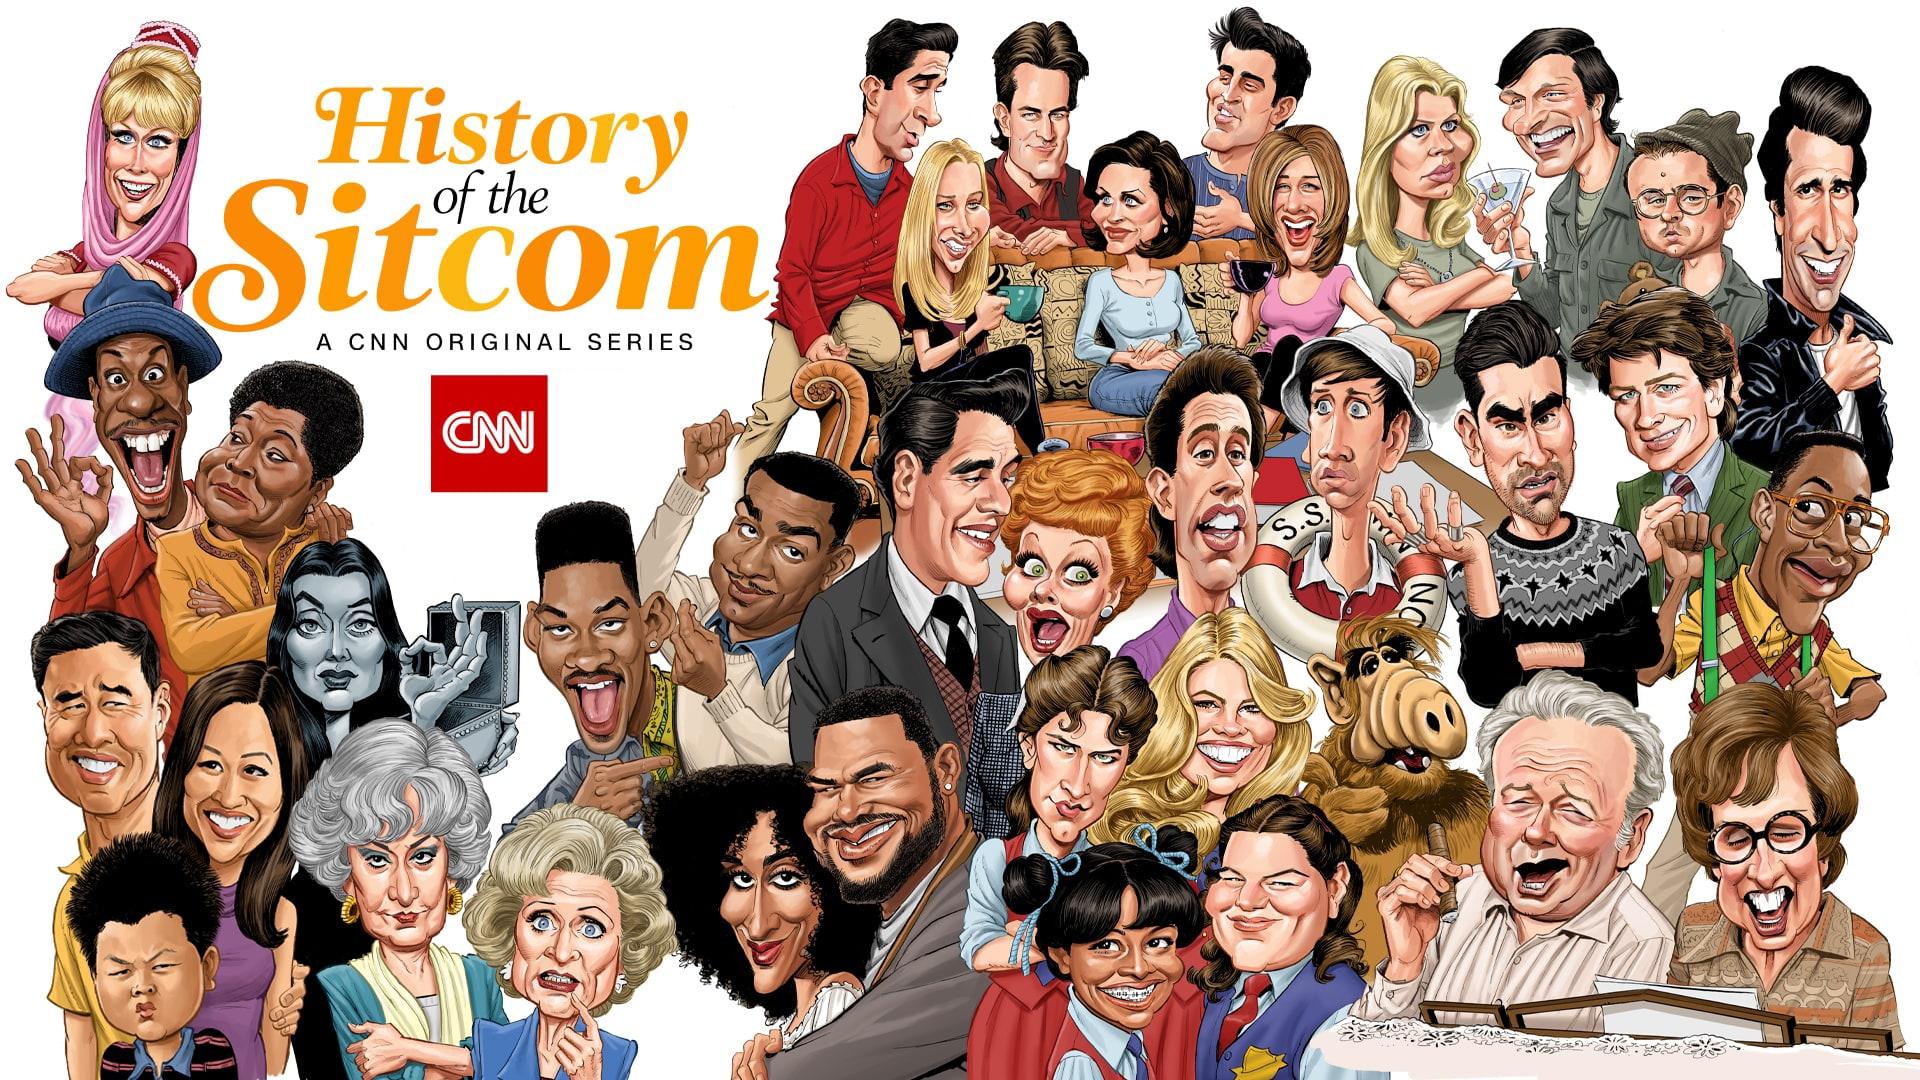 History of the Sitcom | CNN Creative Marketing